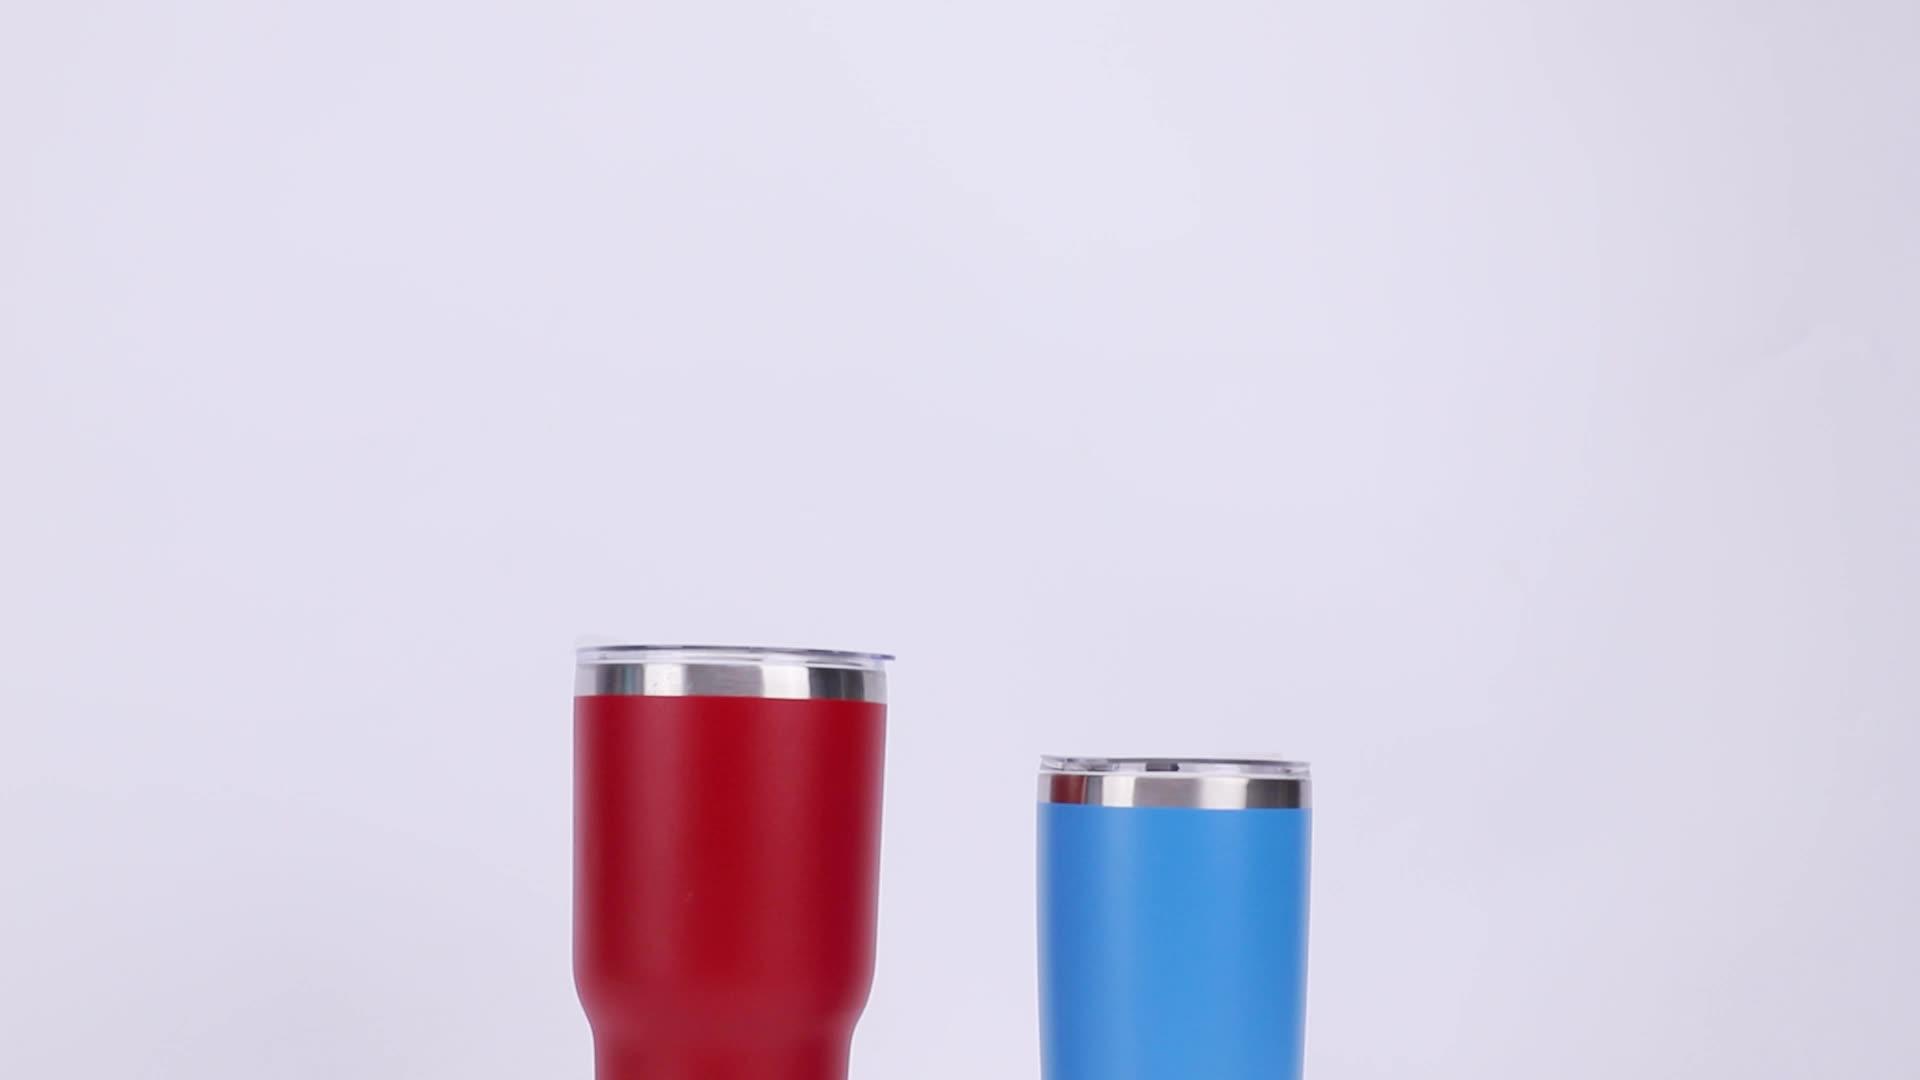 Factory Directly 30 oz stainless steel tumbler double wall vacuum mug wholesale travel mugs customizable